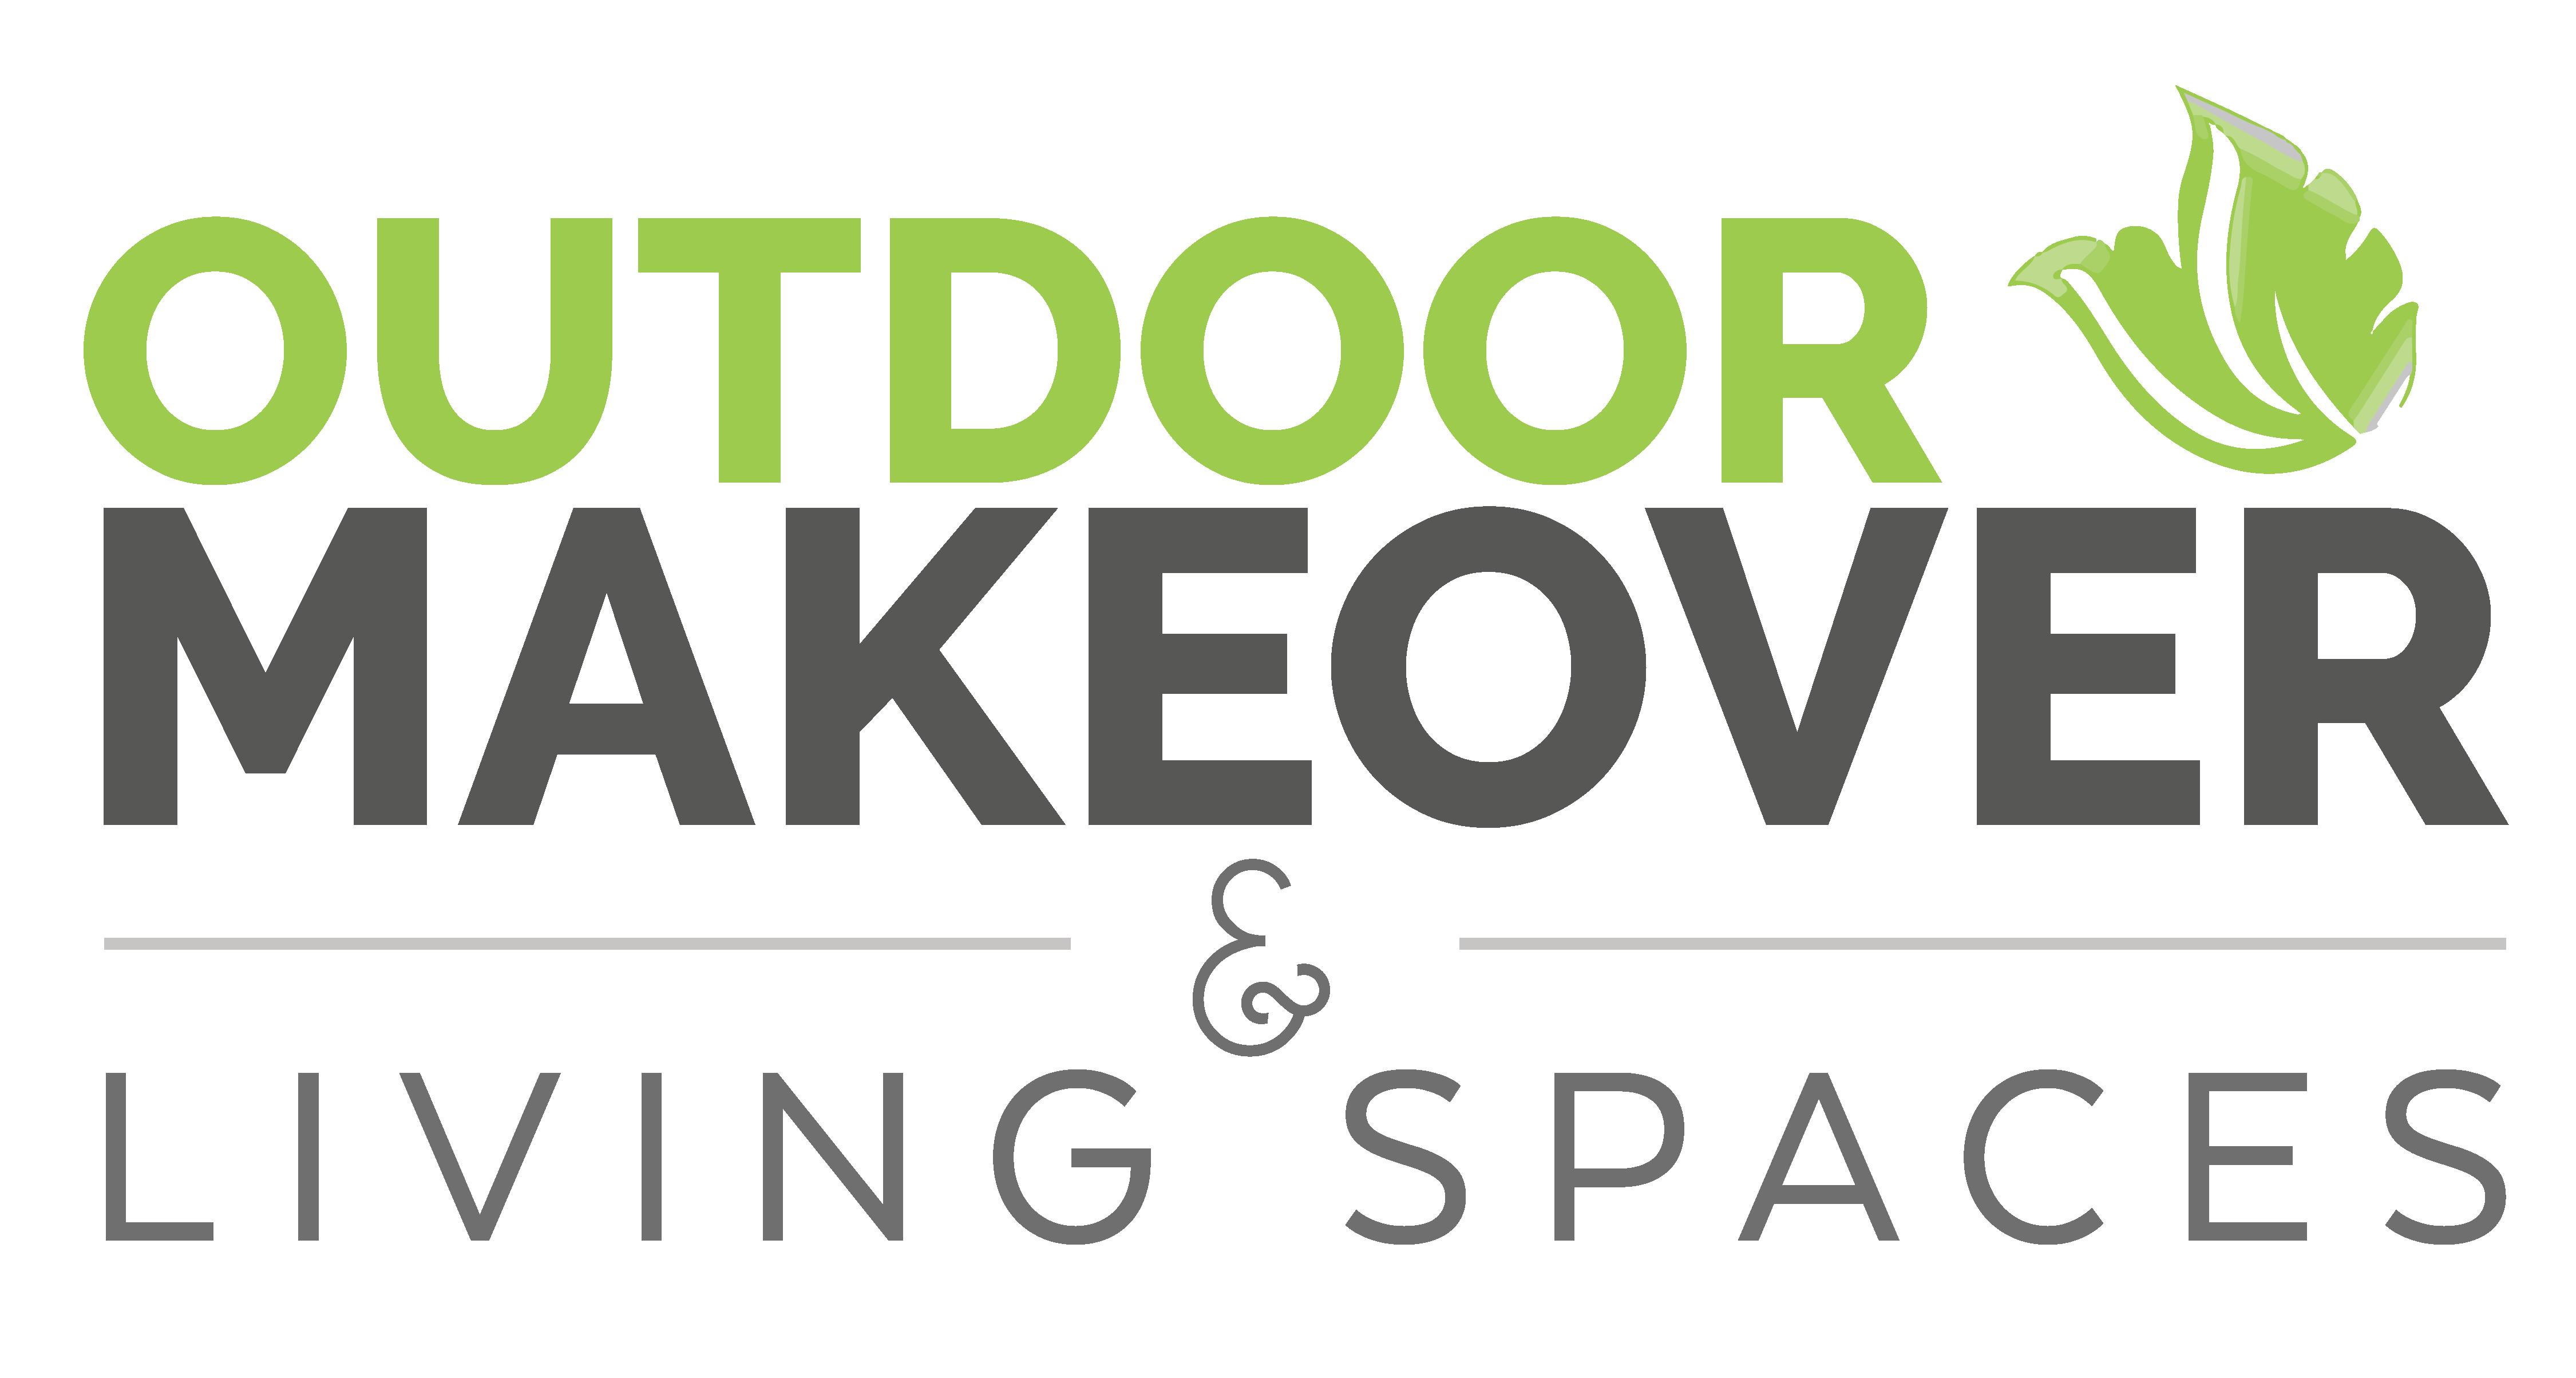 om-logo-outdoor-makeover-and-living-spaces-drafts-navids-favorite-01-1.png